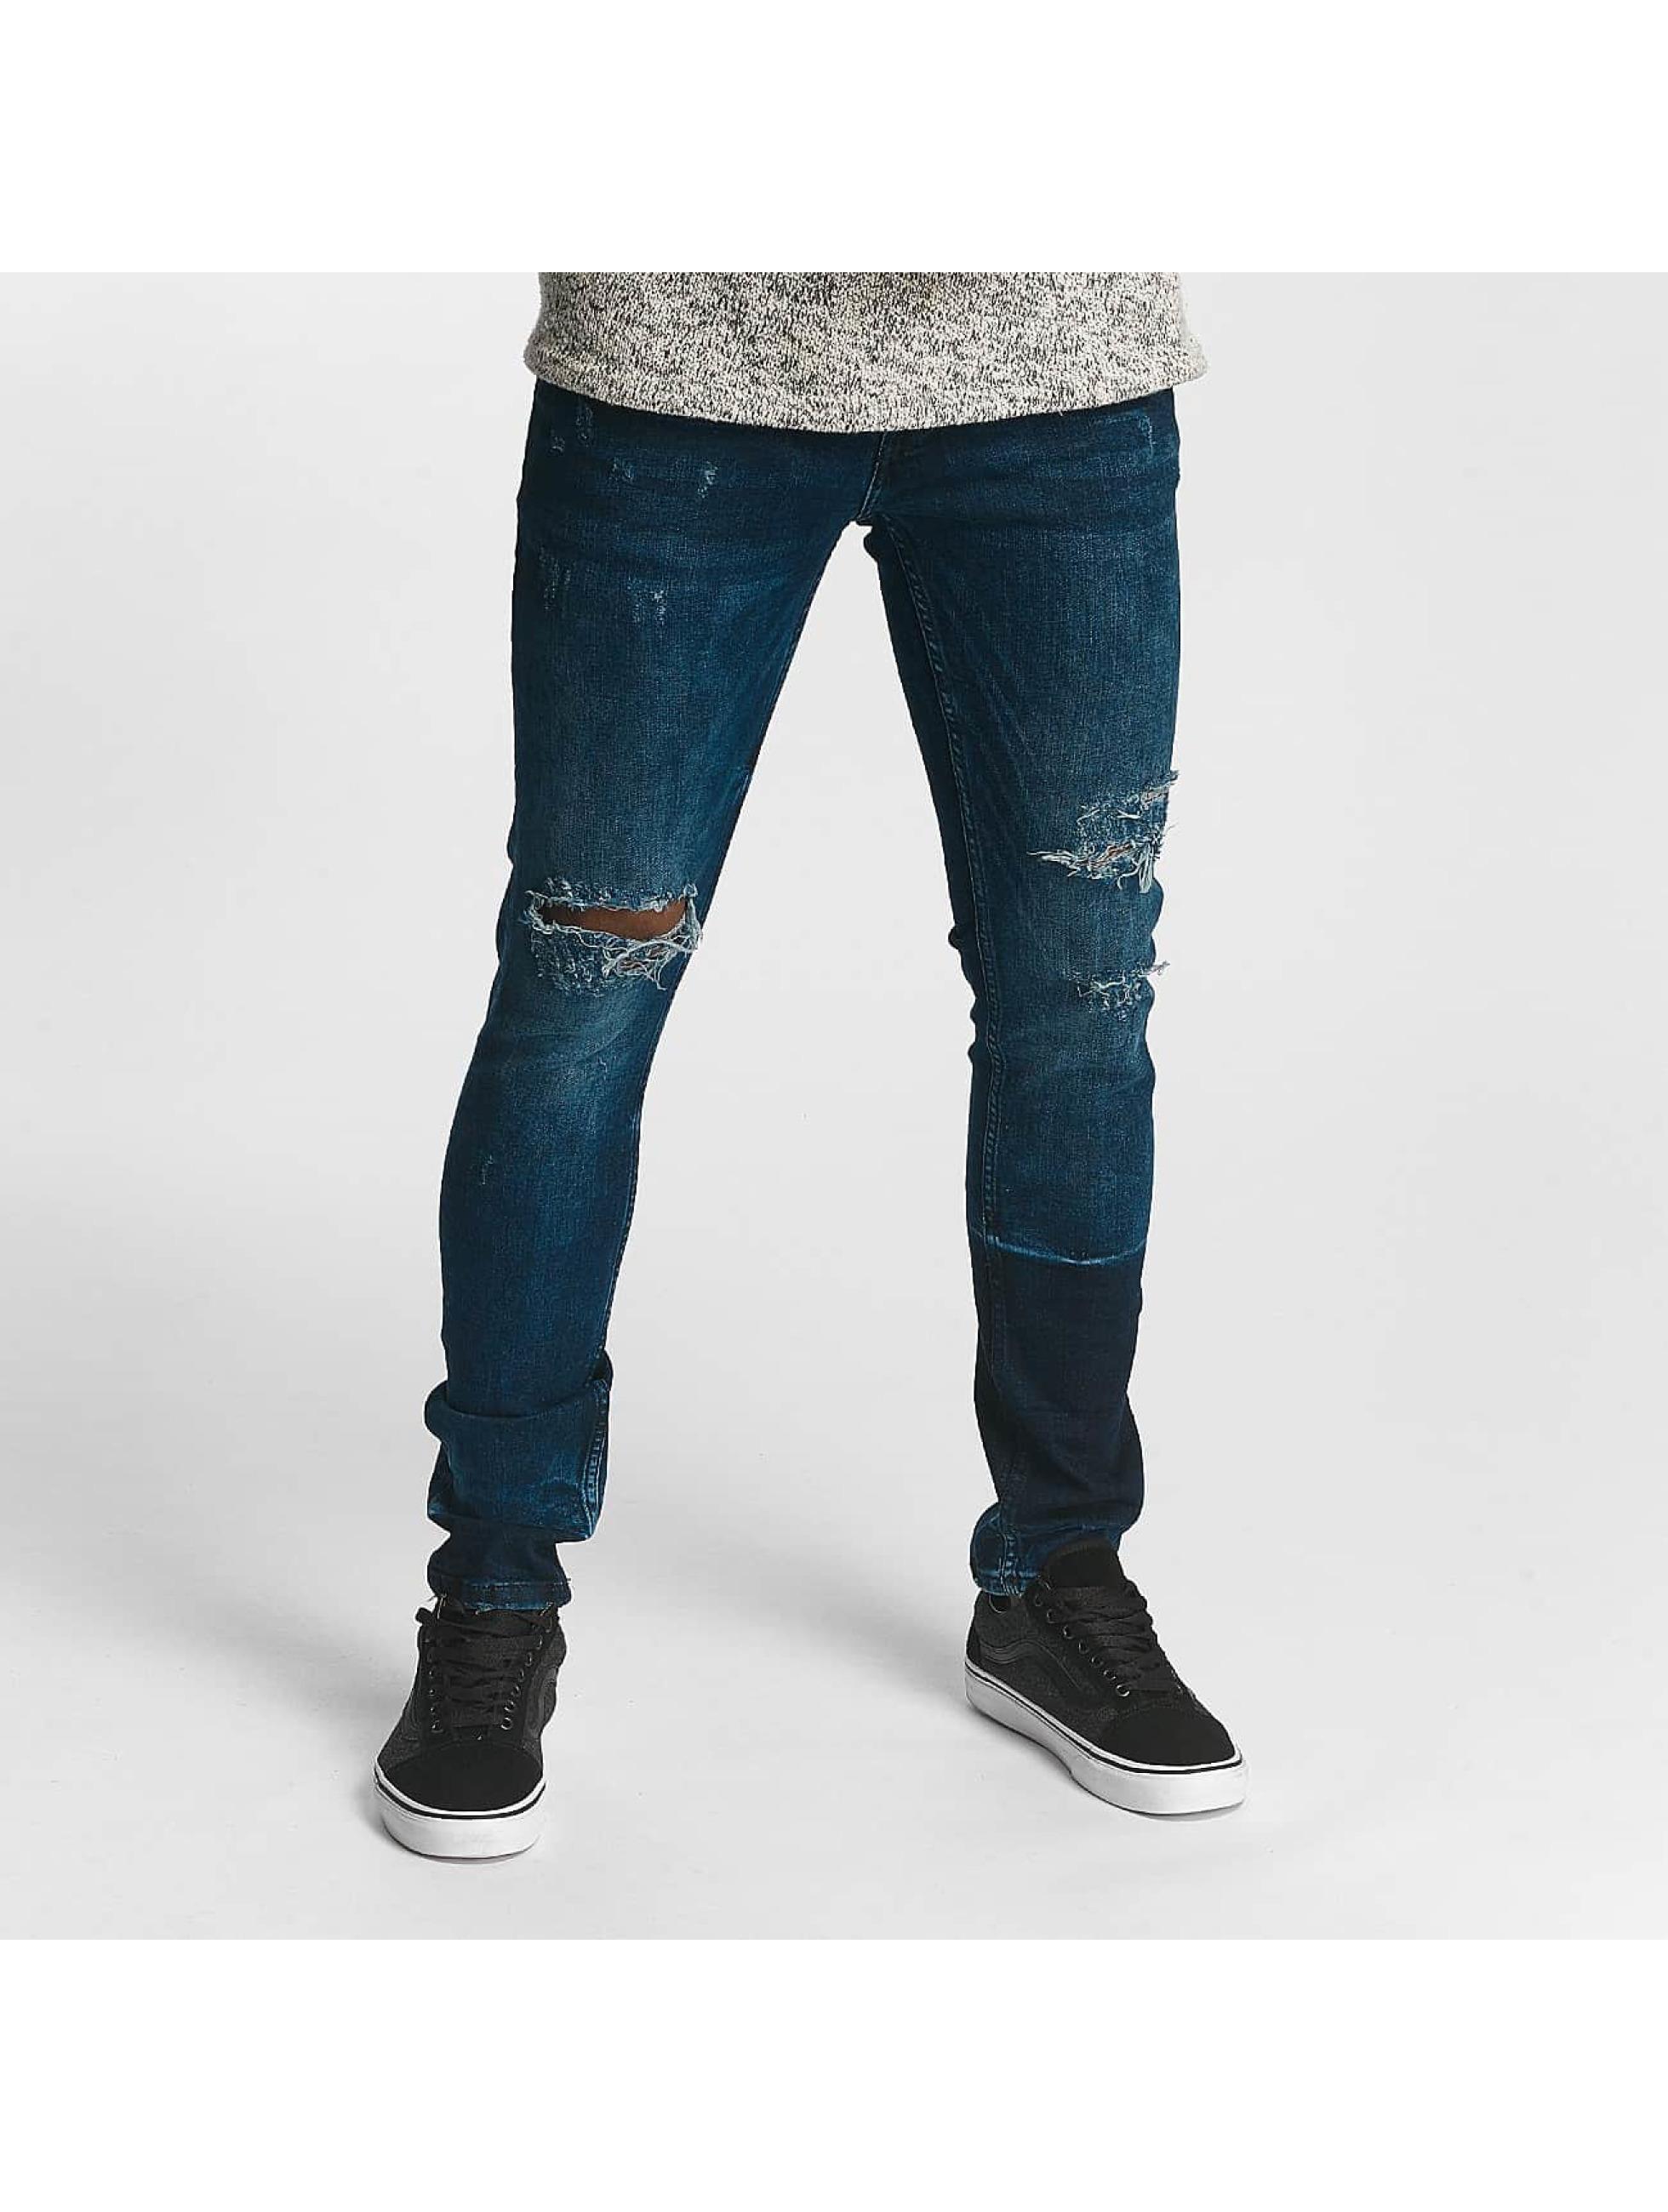 2Y / Slim Fit Jeans Joseph in blue W 34